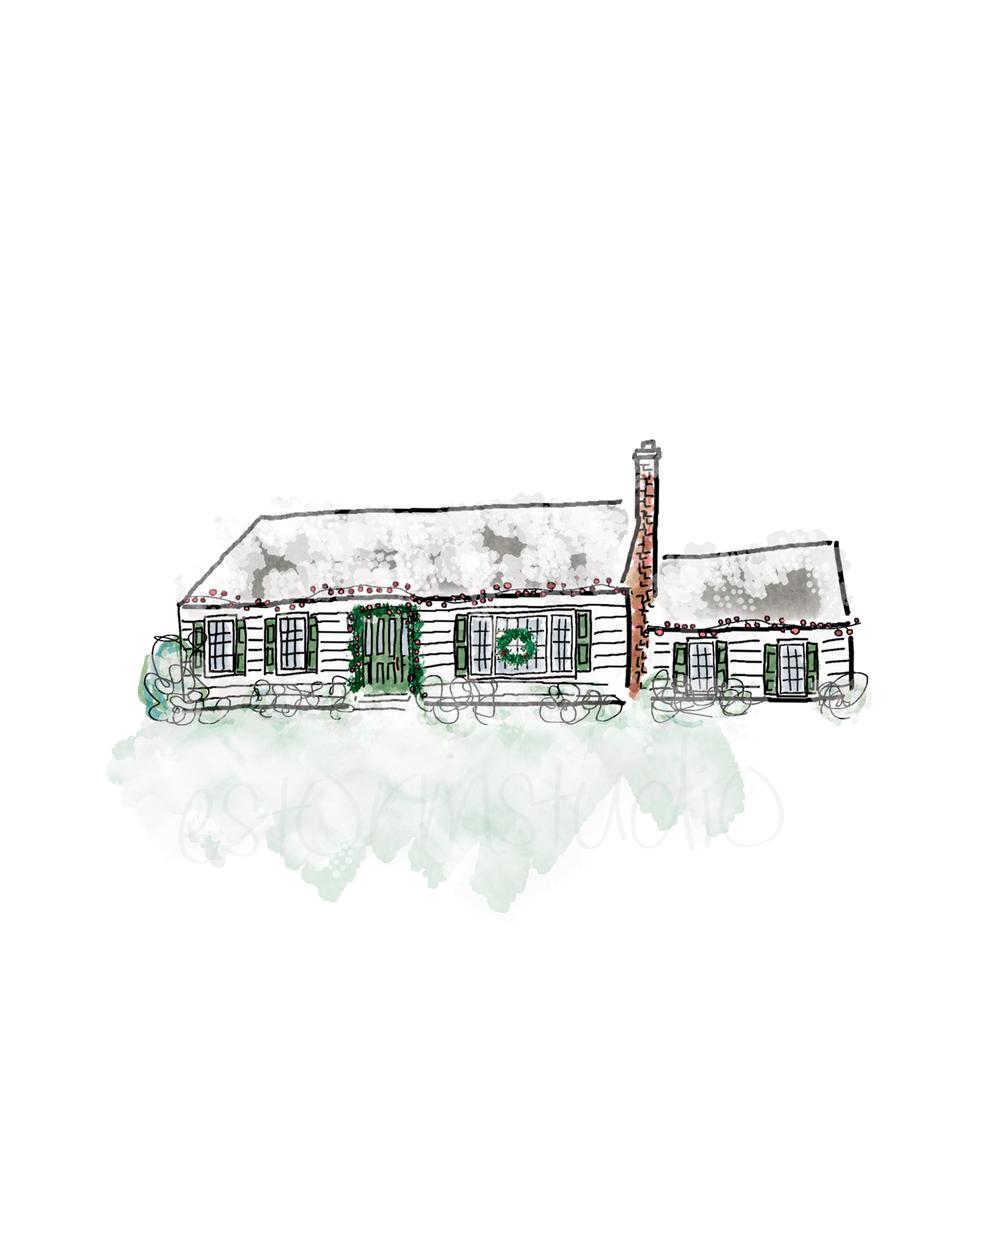 custom-home-illustration-estormstudio+copy-1.png